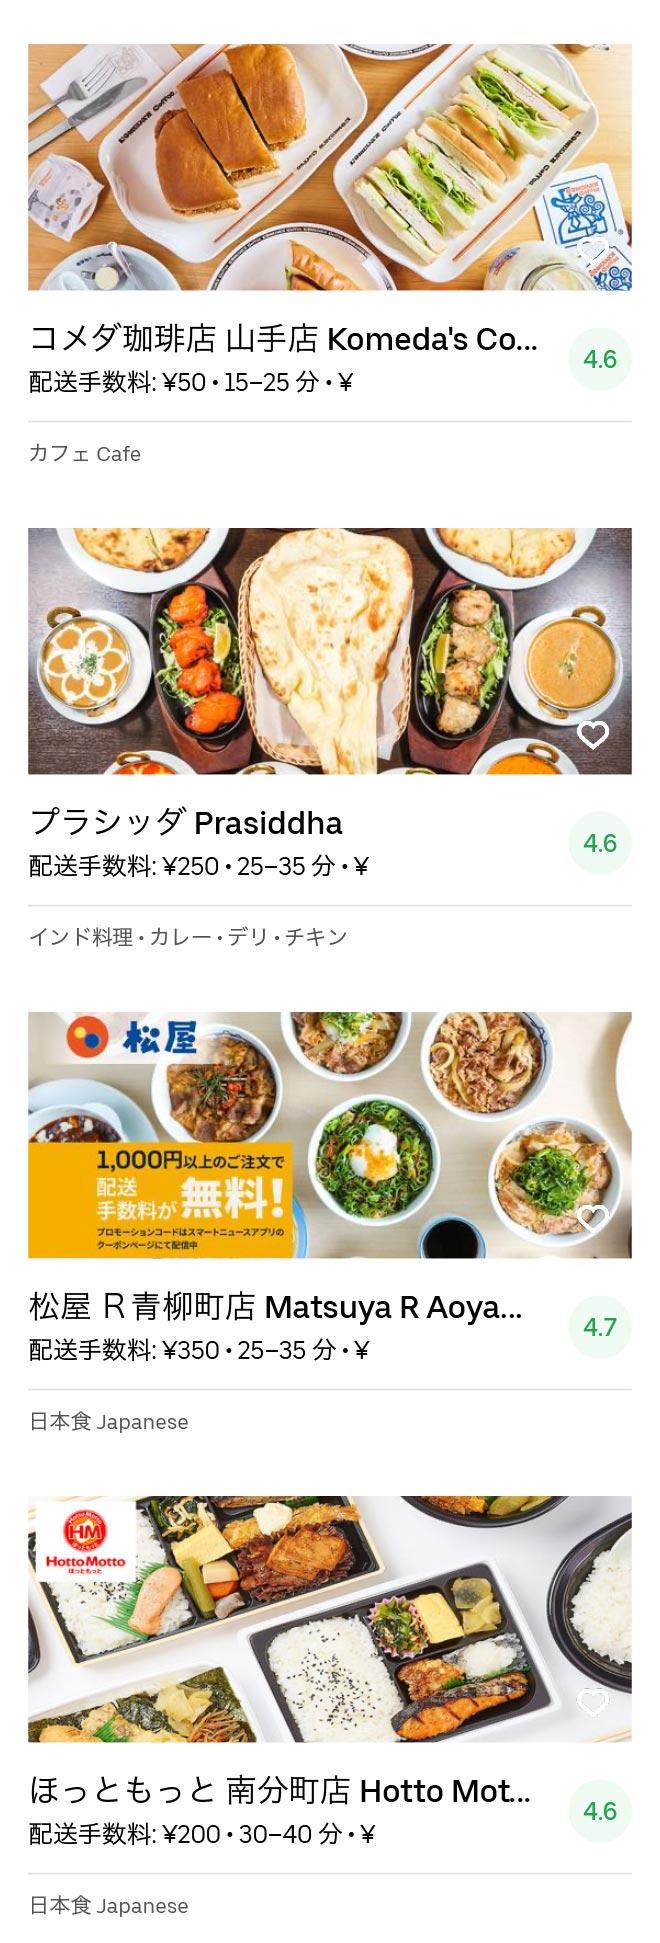 Nagoya yagoto menu 2005 06